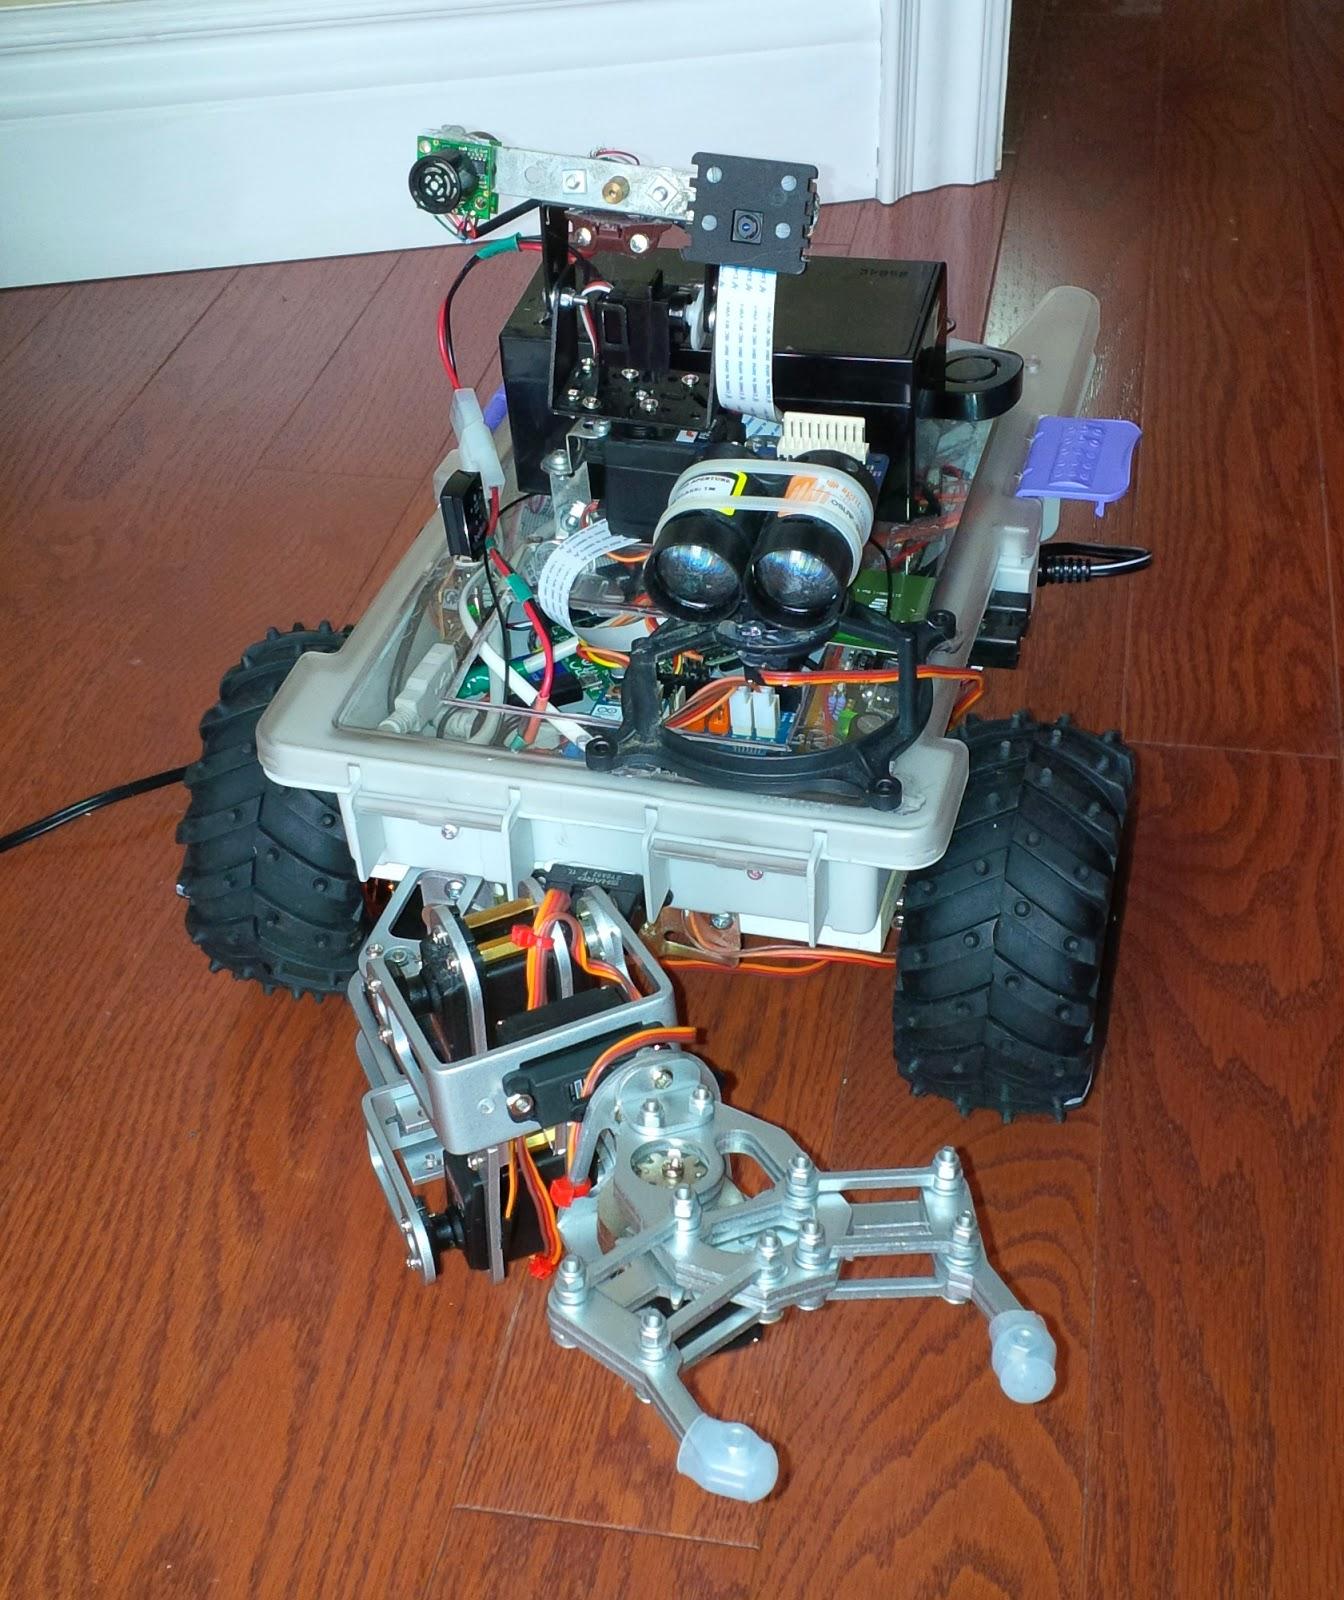 mars rover arduino code - photo #8